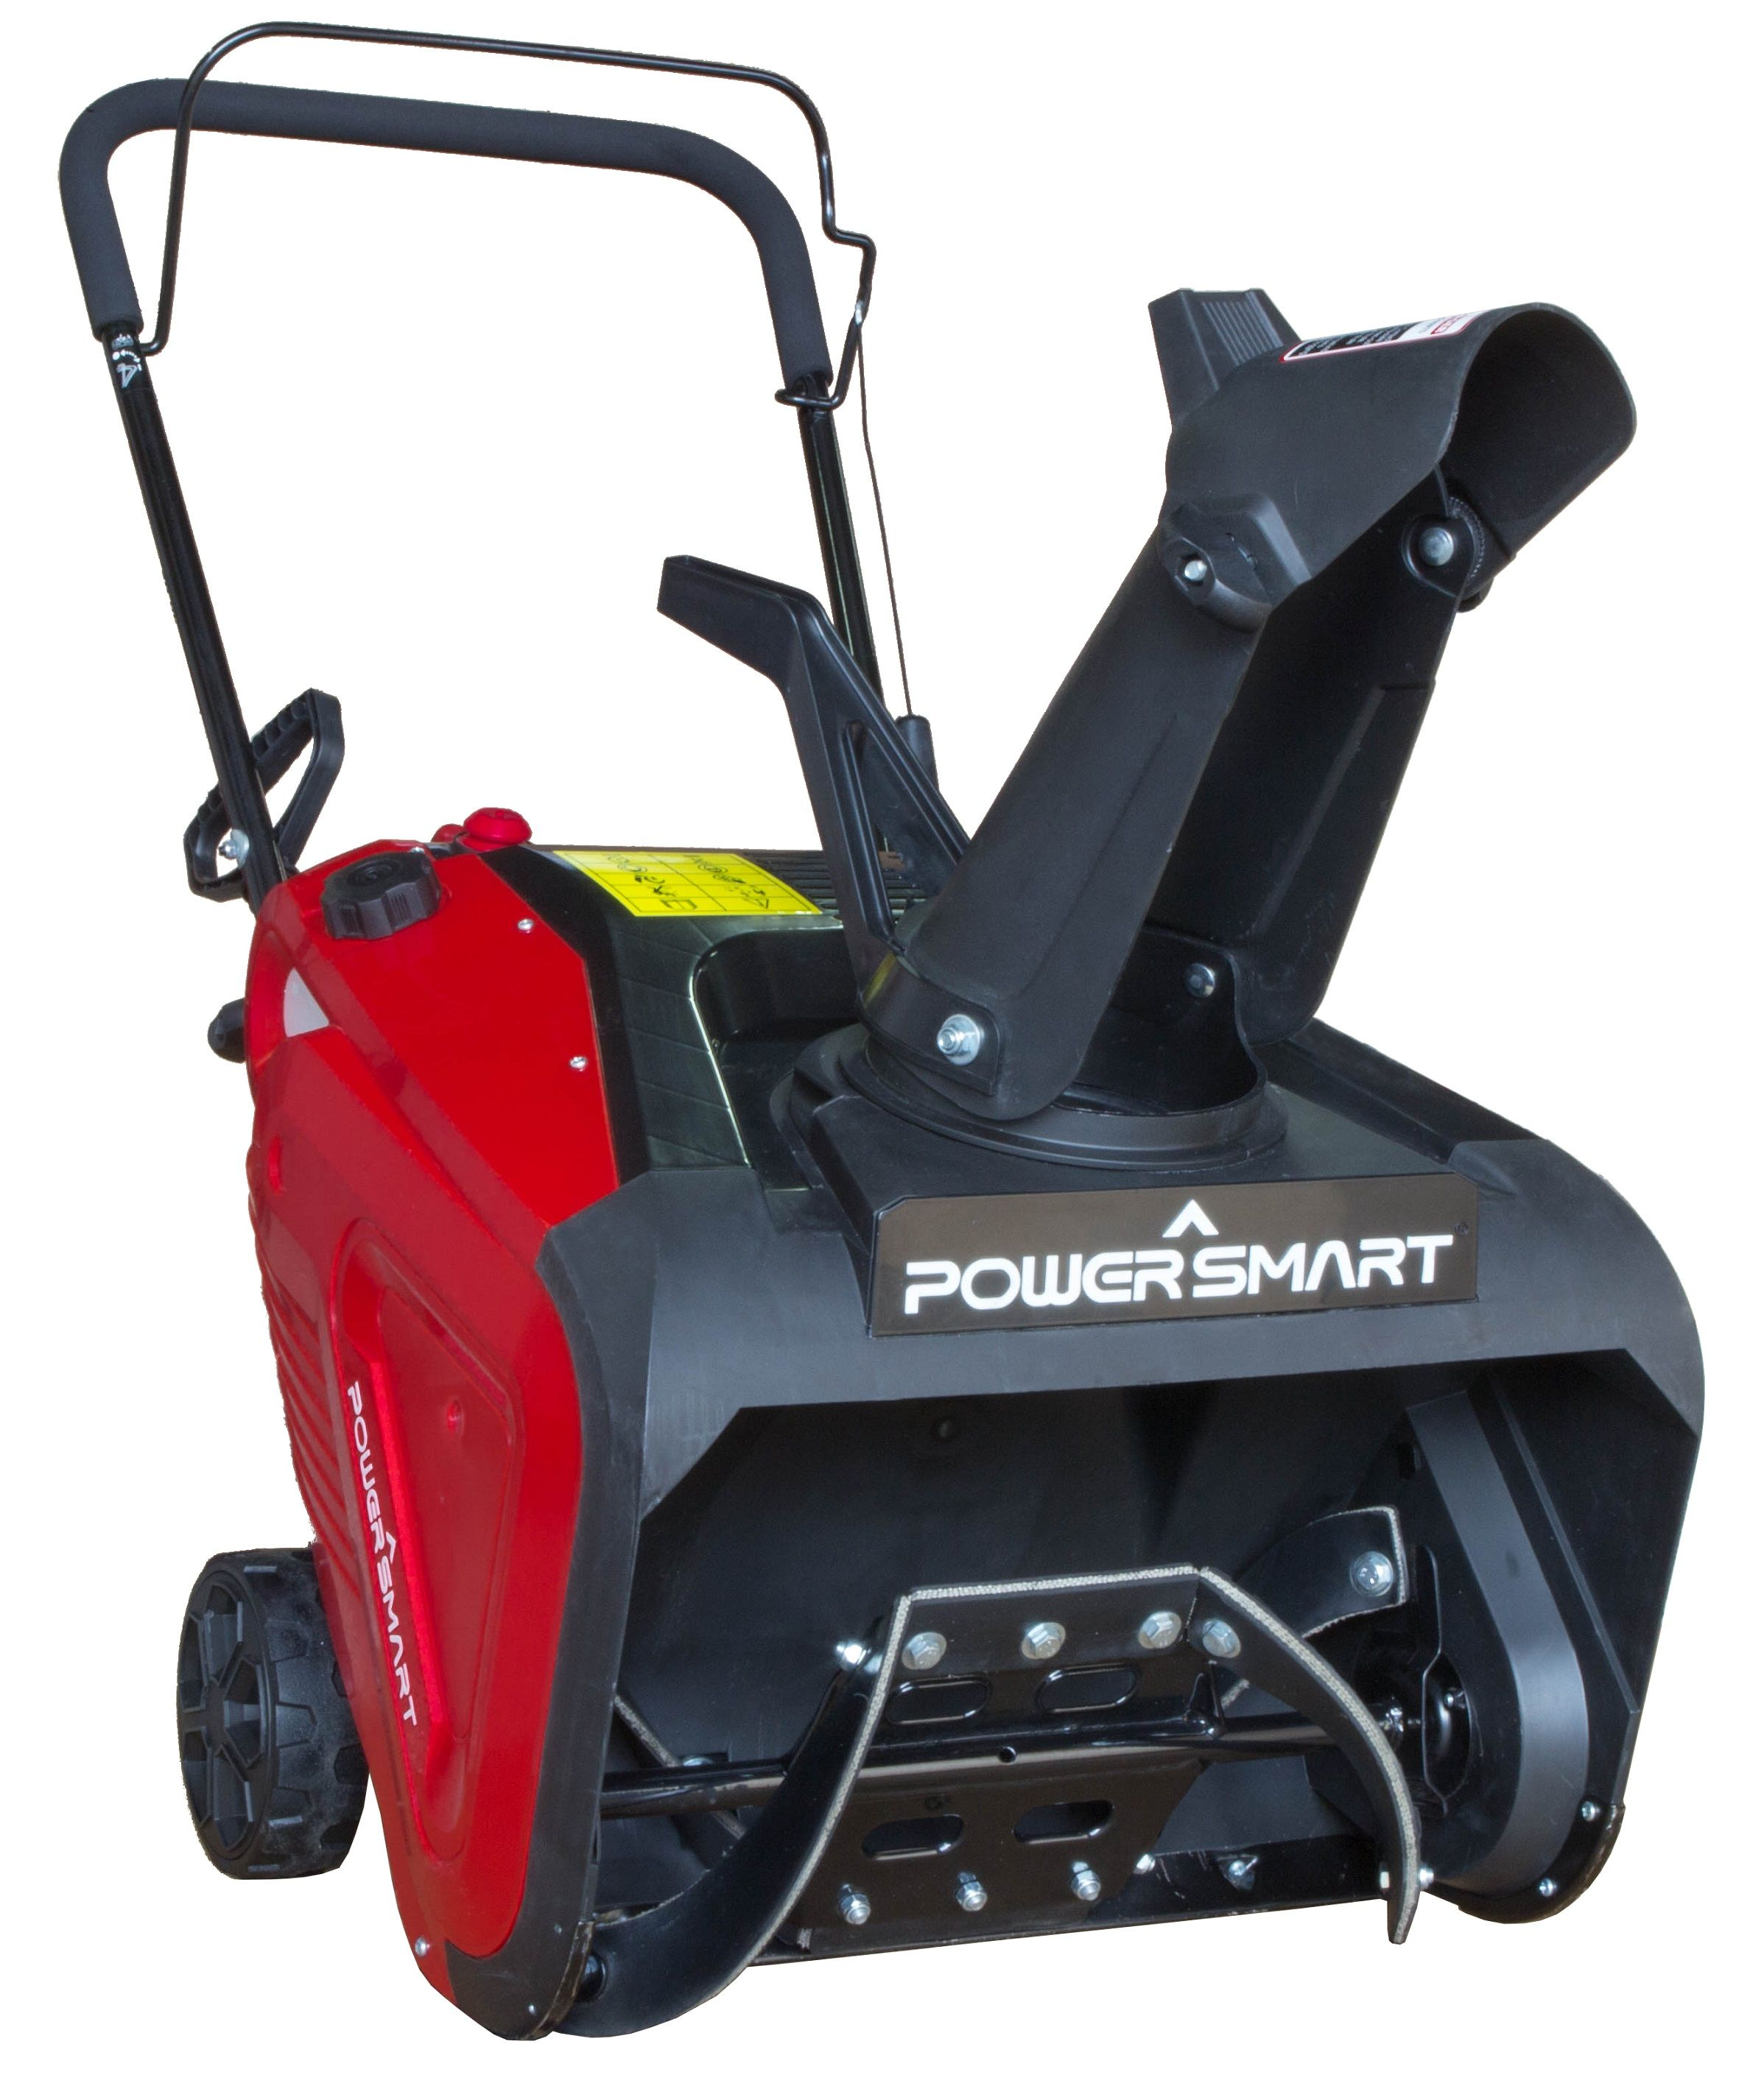 power smart db7005 21 196cc manual start single stage snow blower [ 2376 x 2852 Pixel ]